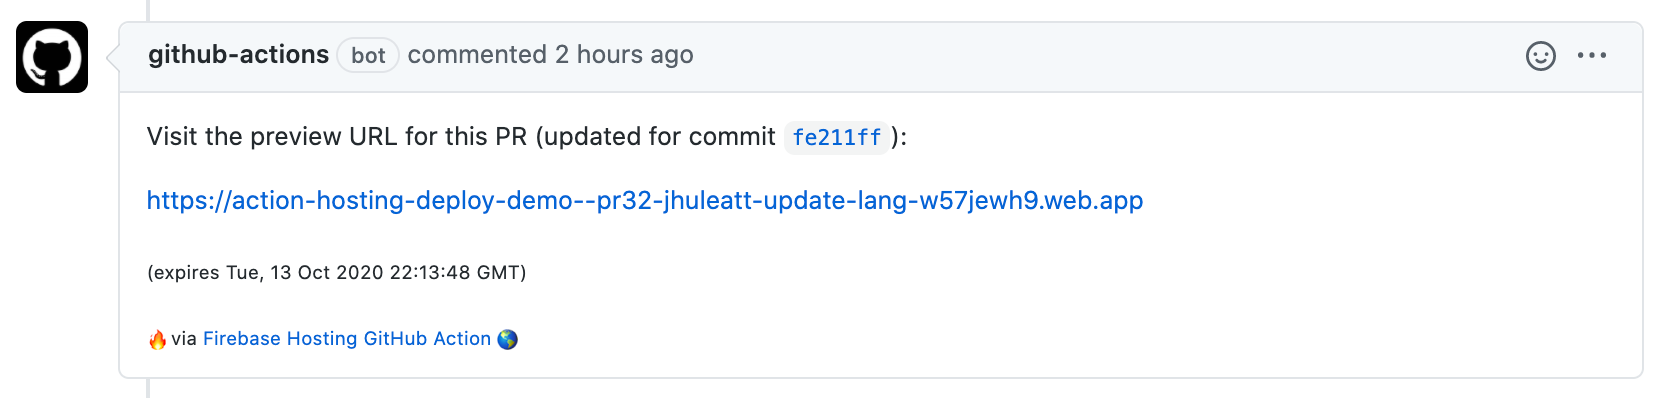 帶有預覽 URL 的 GitHub Action PR 評論圖像